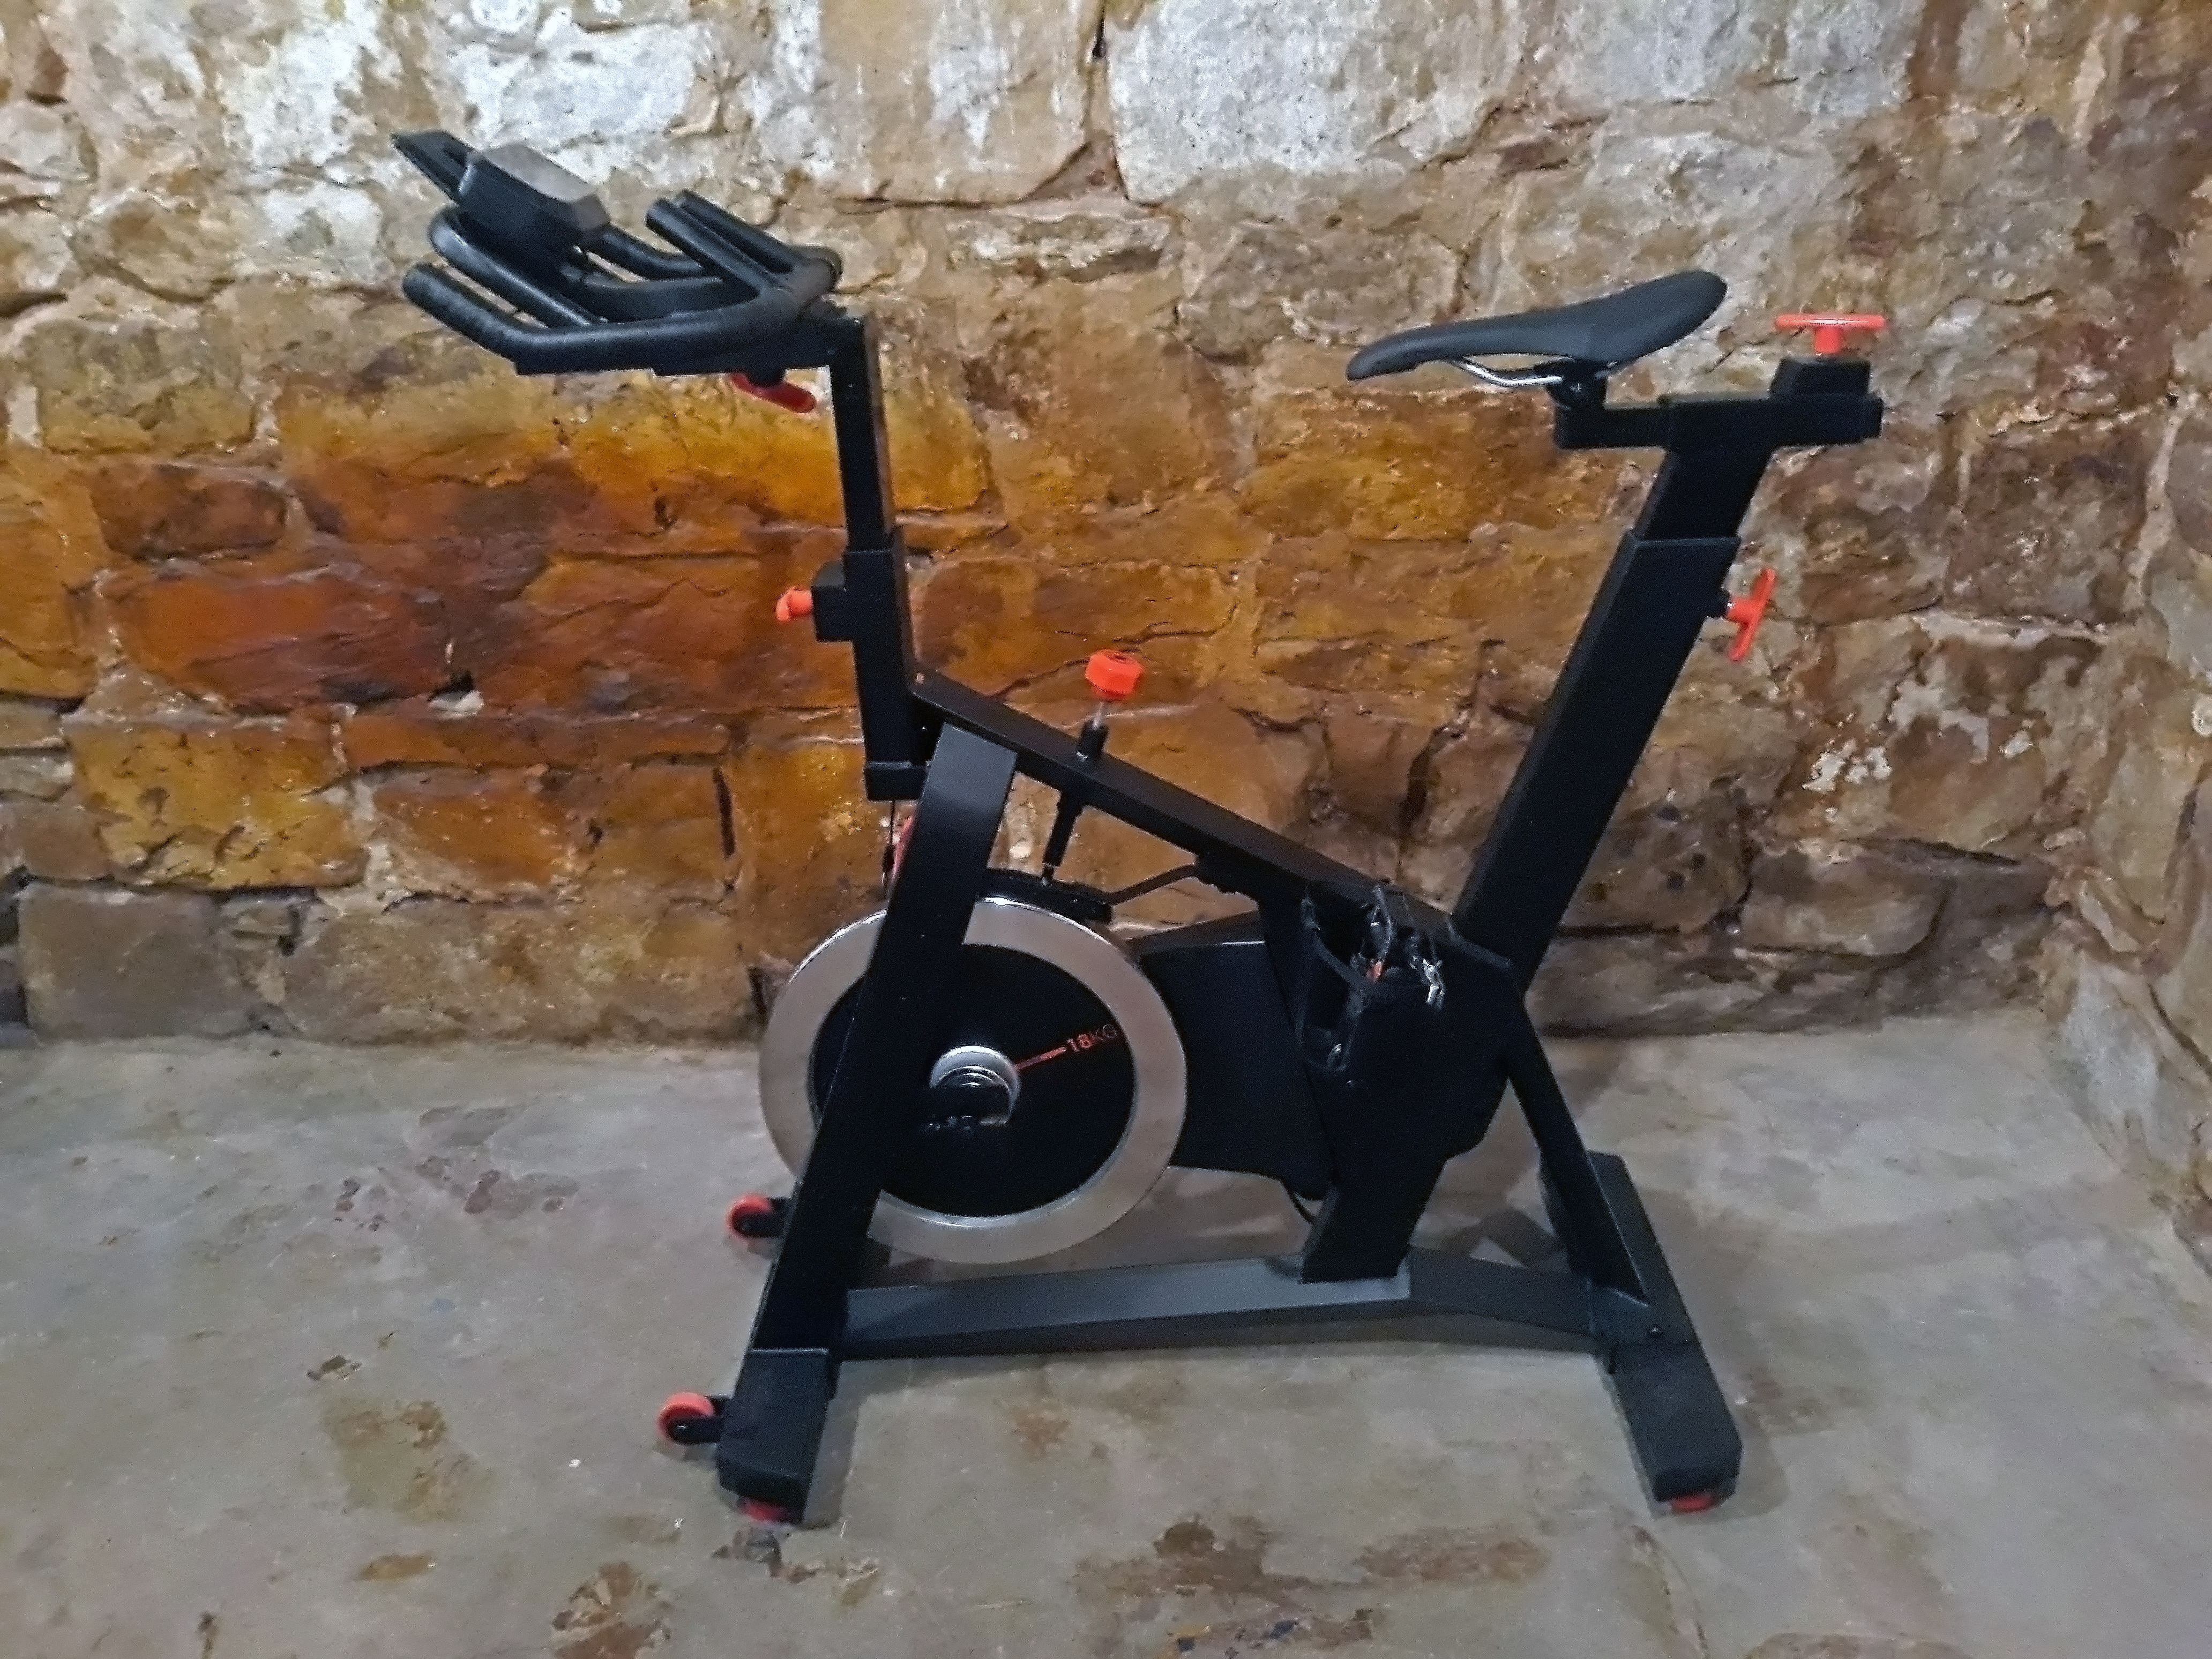 Decathlon Domyos exercise bike basement